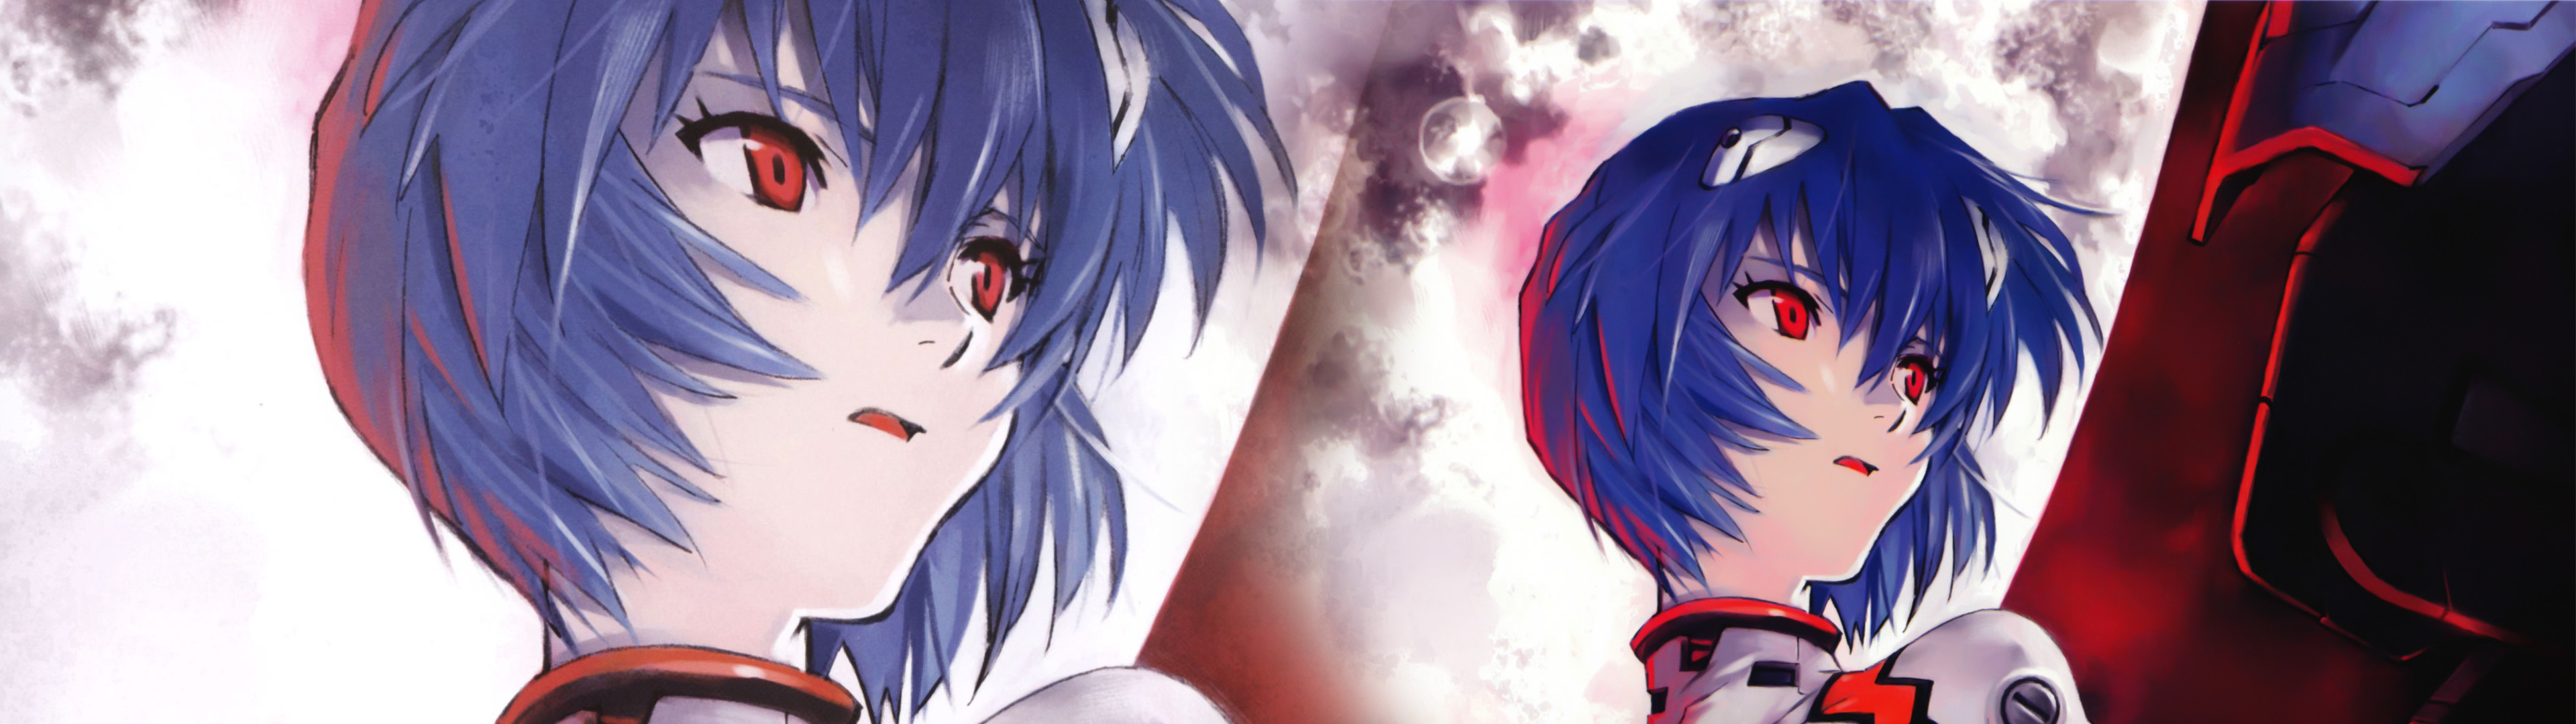 Ayanami Rei, Neon Genesis Evangelion, Moon, Face, Anime Girls, Sitting,